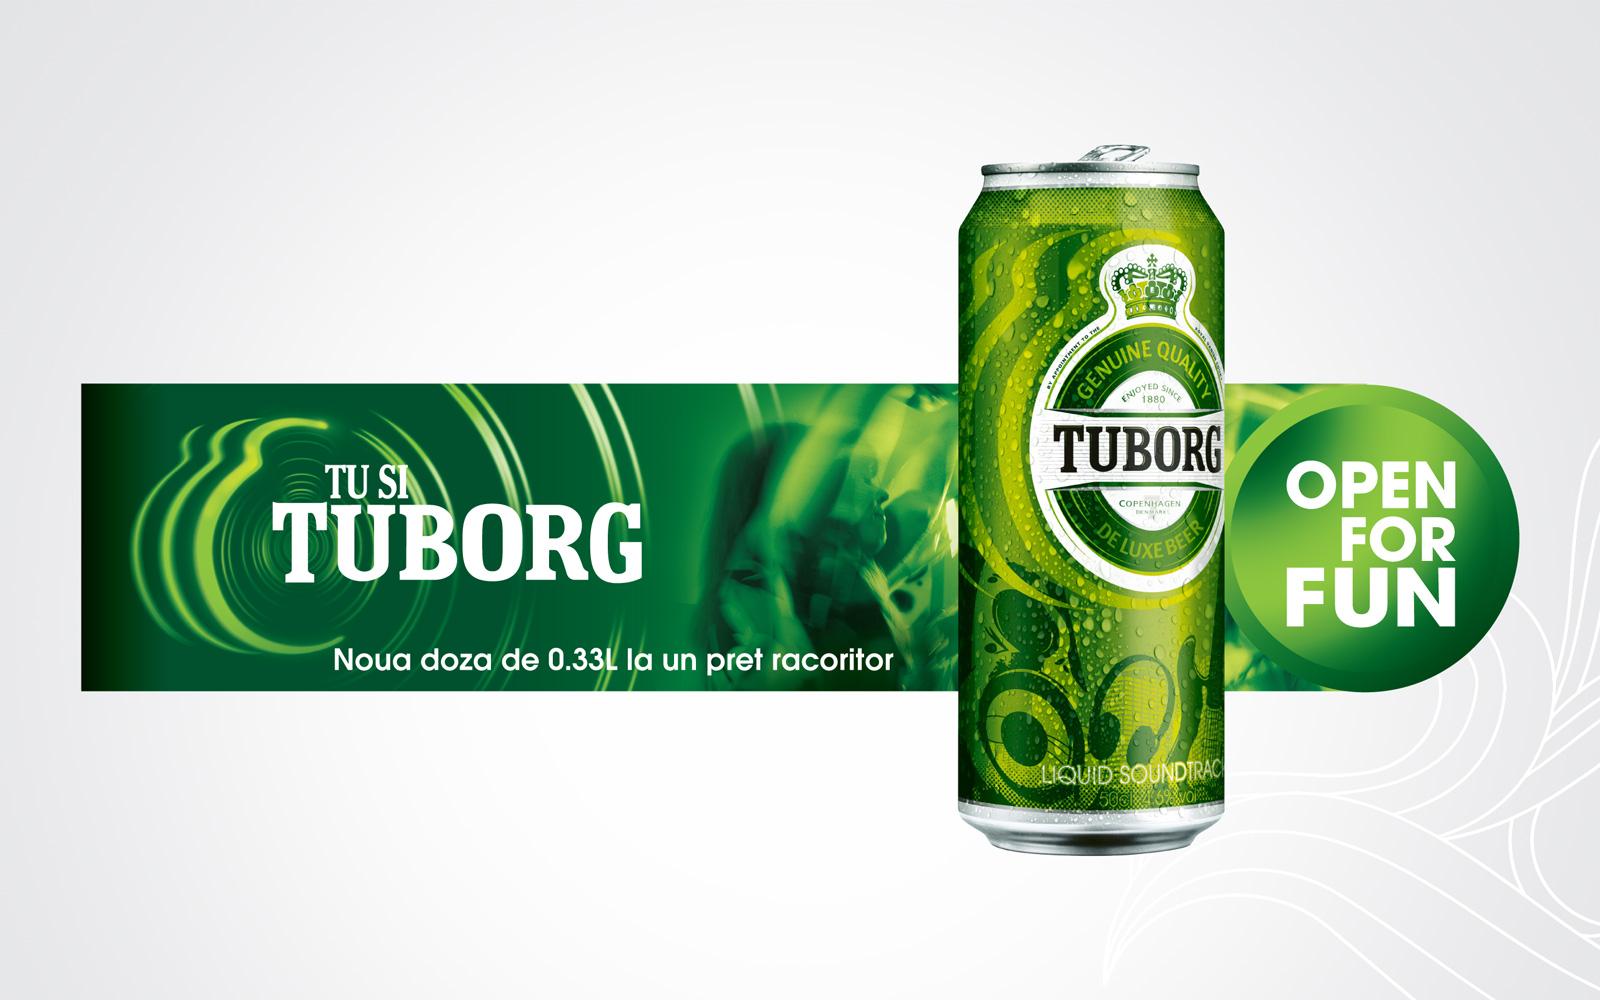 tuborg outdoor design retail promotional campaign